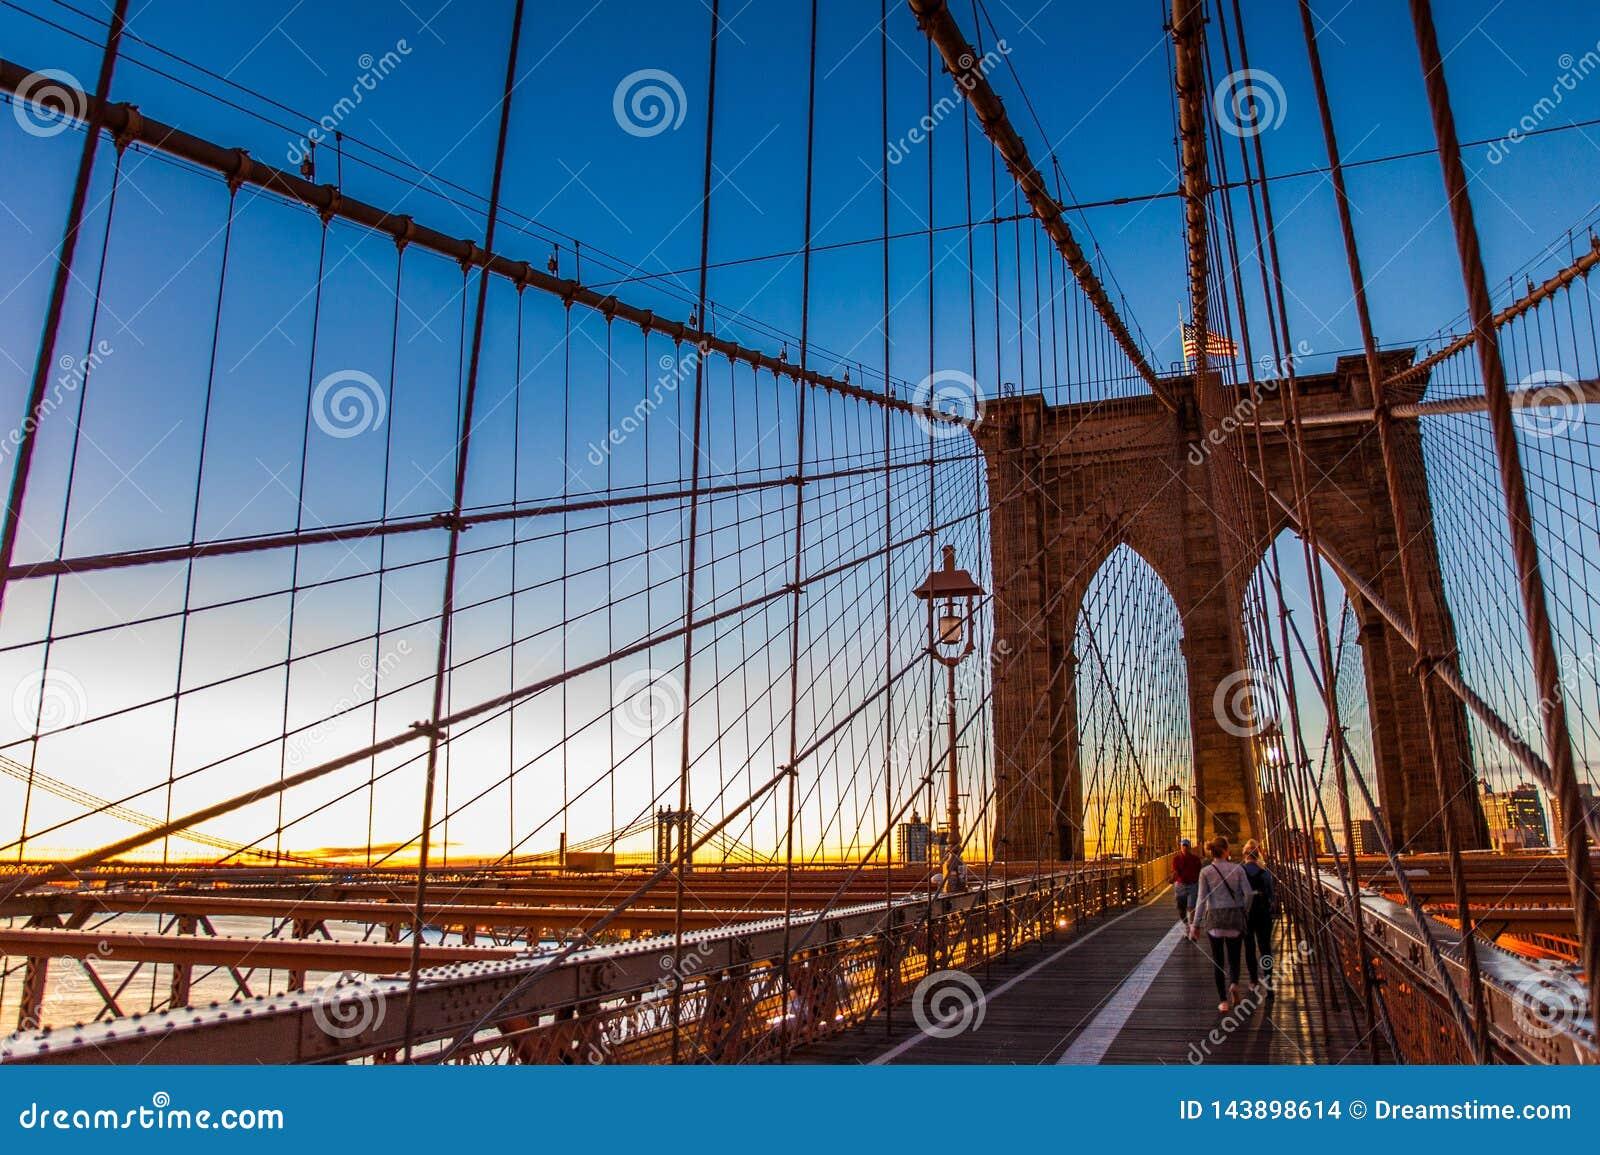 Sunrise on Brooklyn Bridge, Brooklyn, New York, 2016